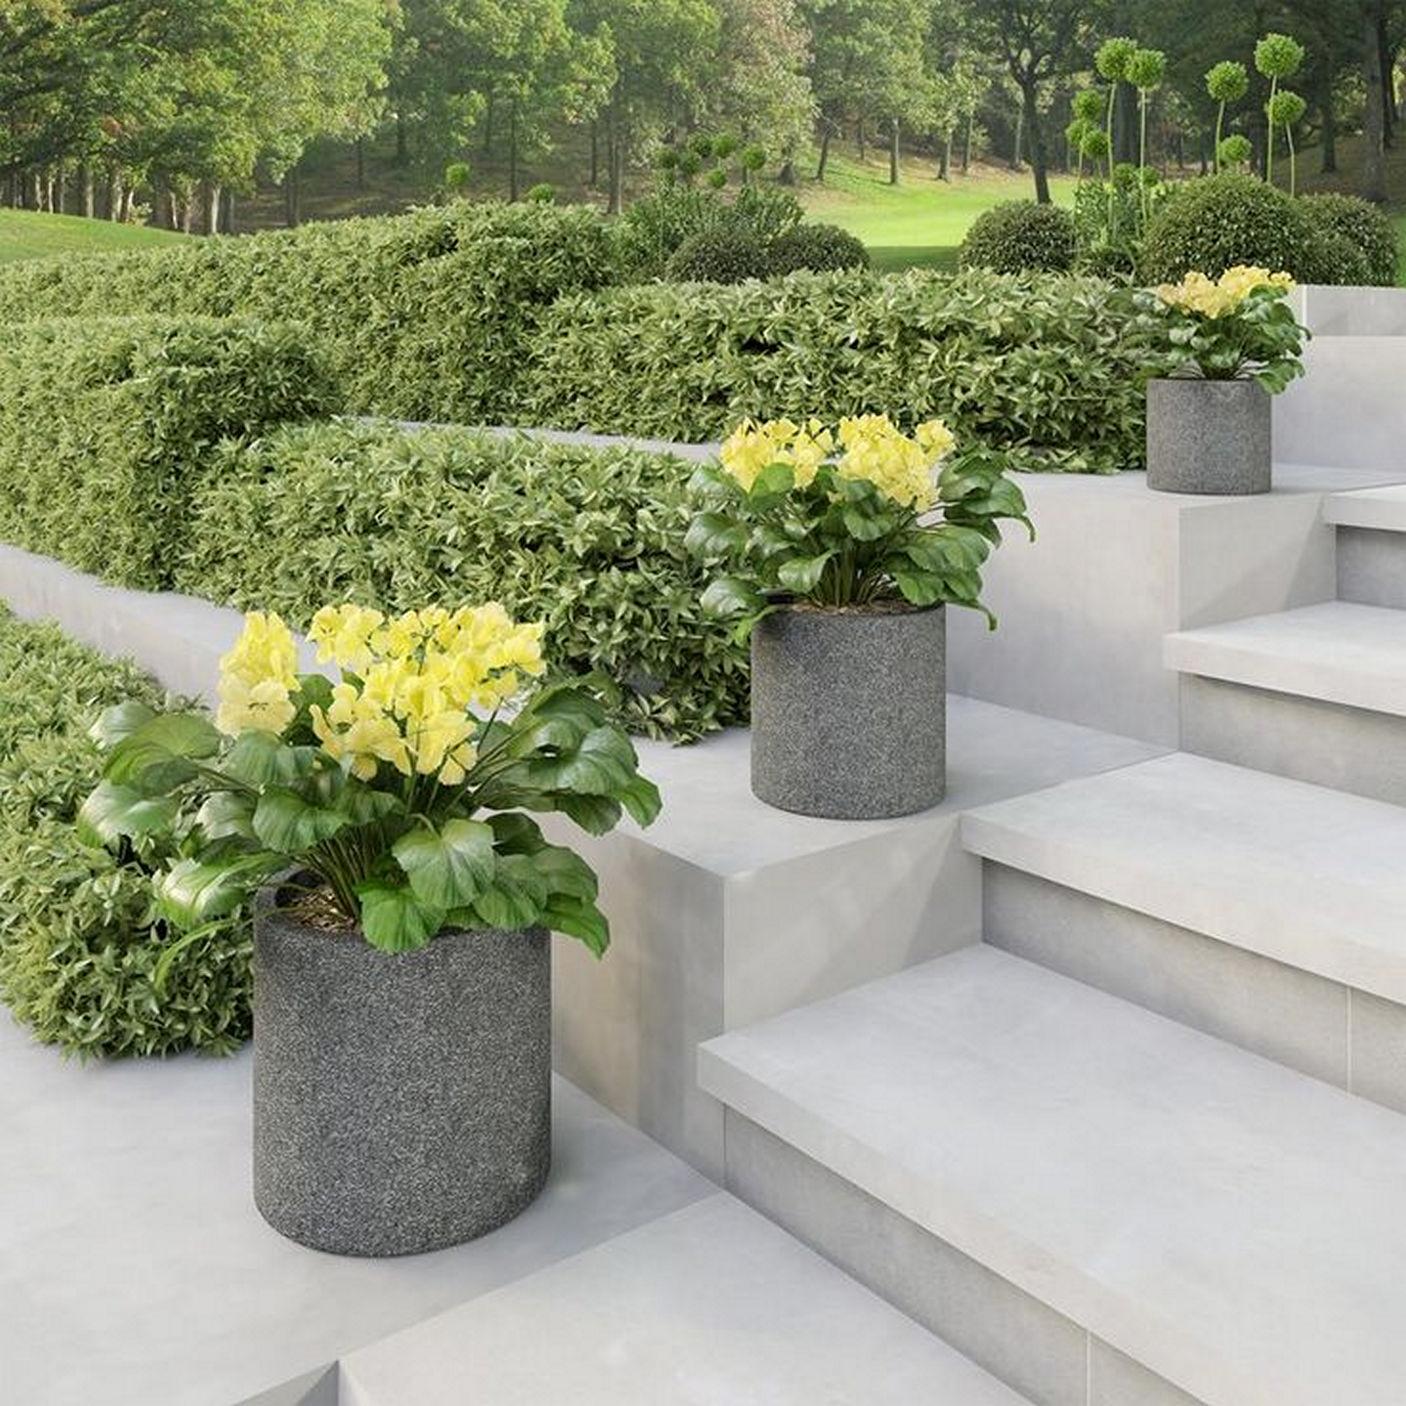 Fantastic concrete planter ideas will be 27 years ago